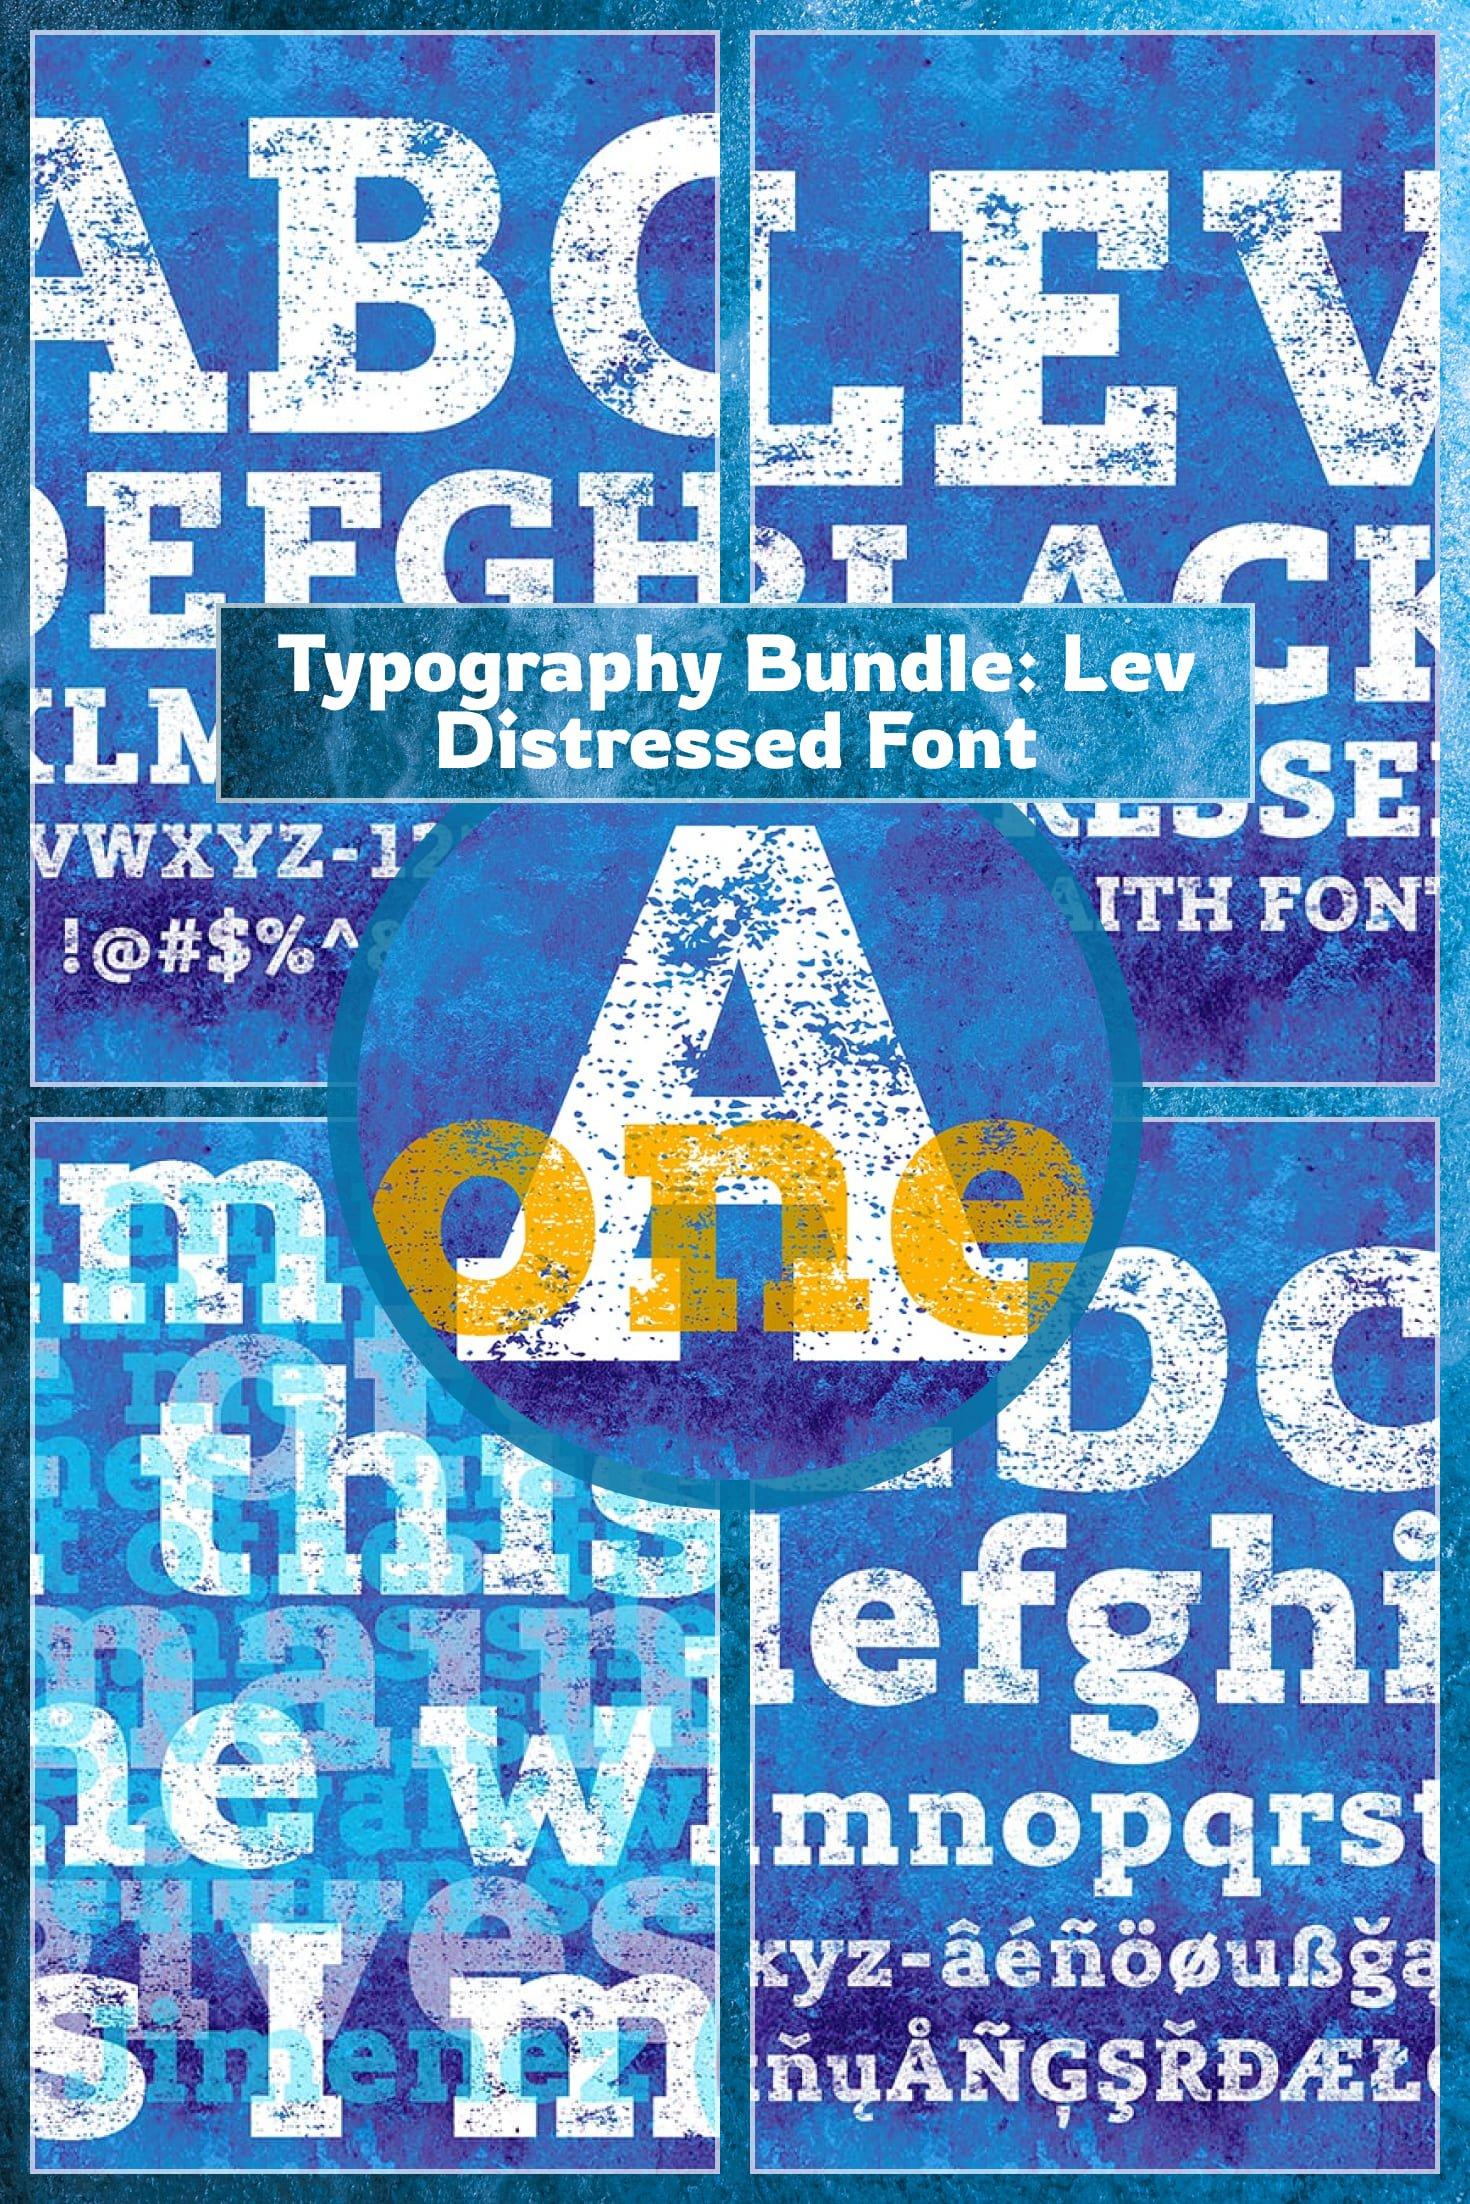 Typography Bundle: Lev Distressed Font. Collage Image.